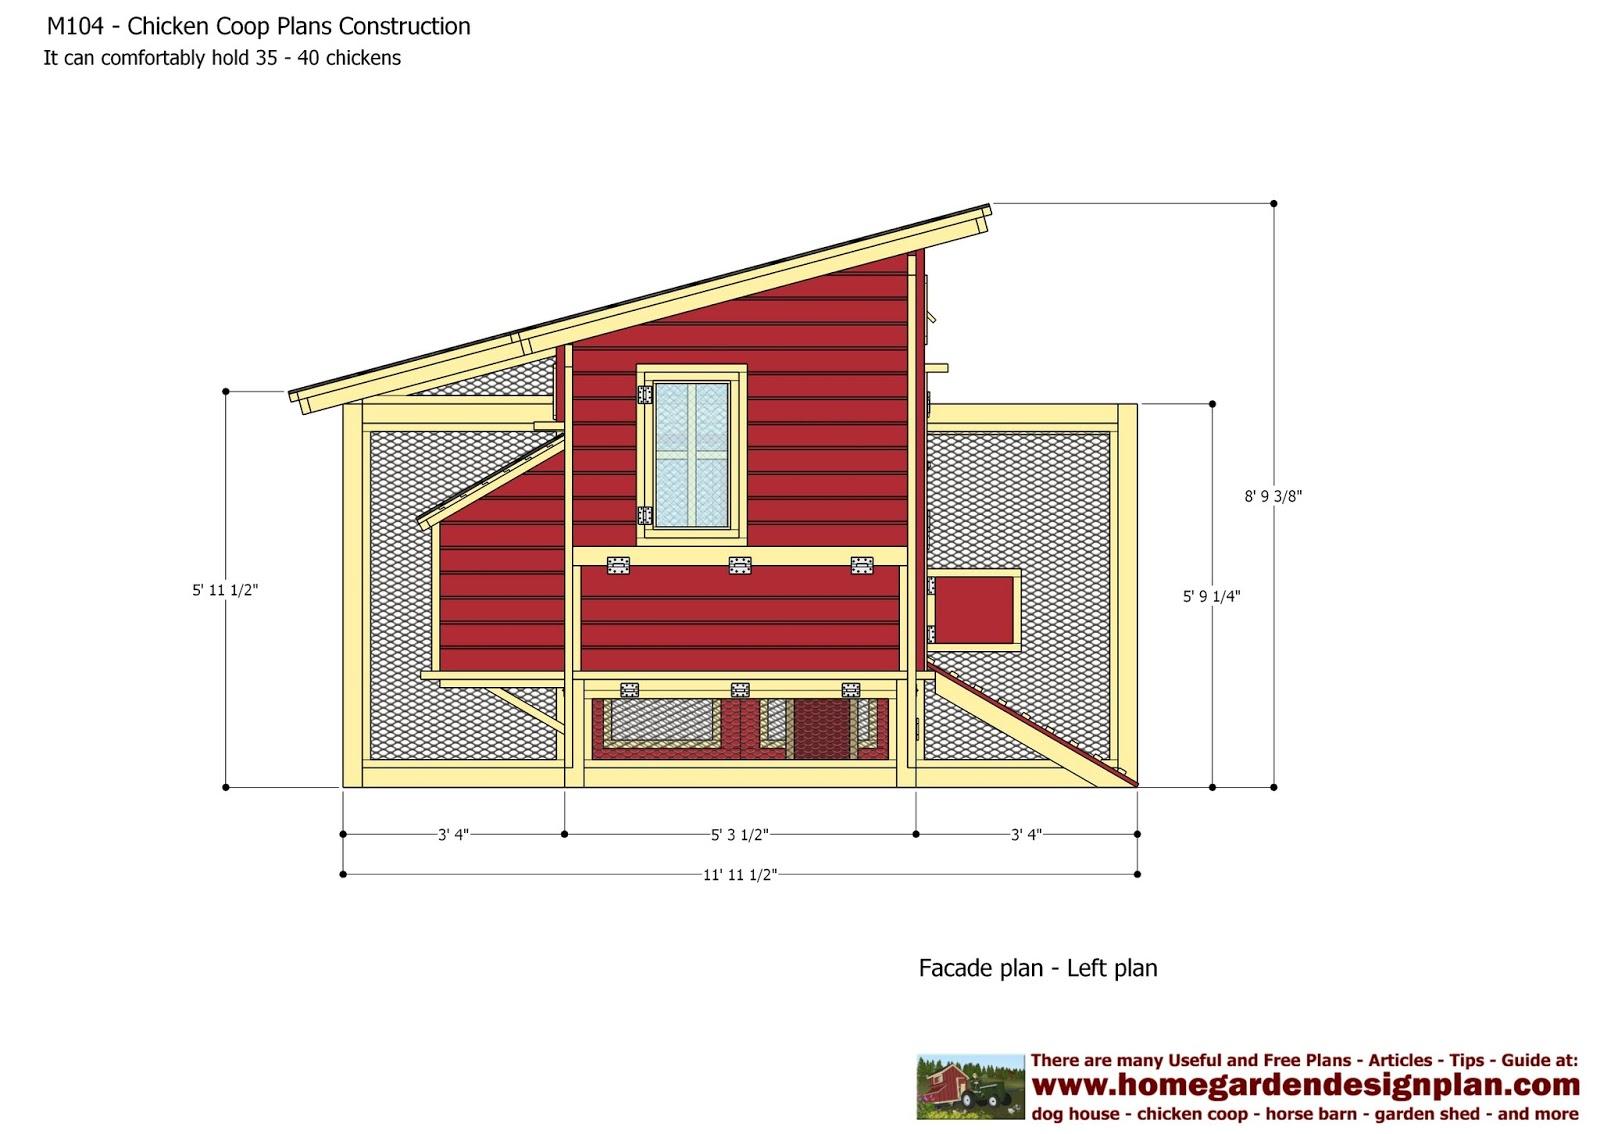 home garden plans: M104 - Chicken Coop Plans Construction ...